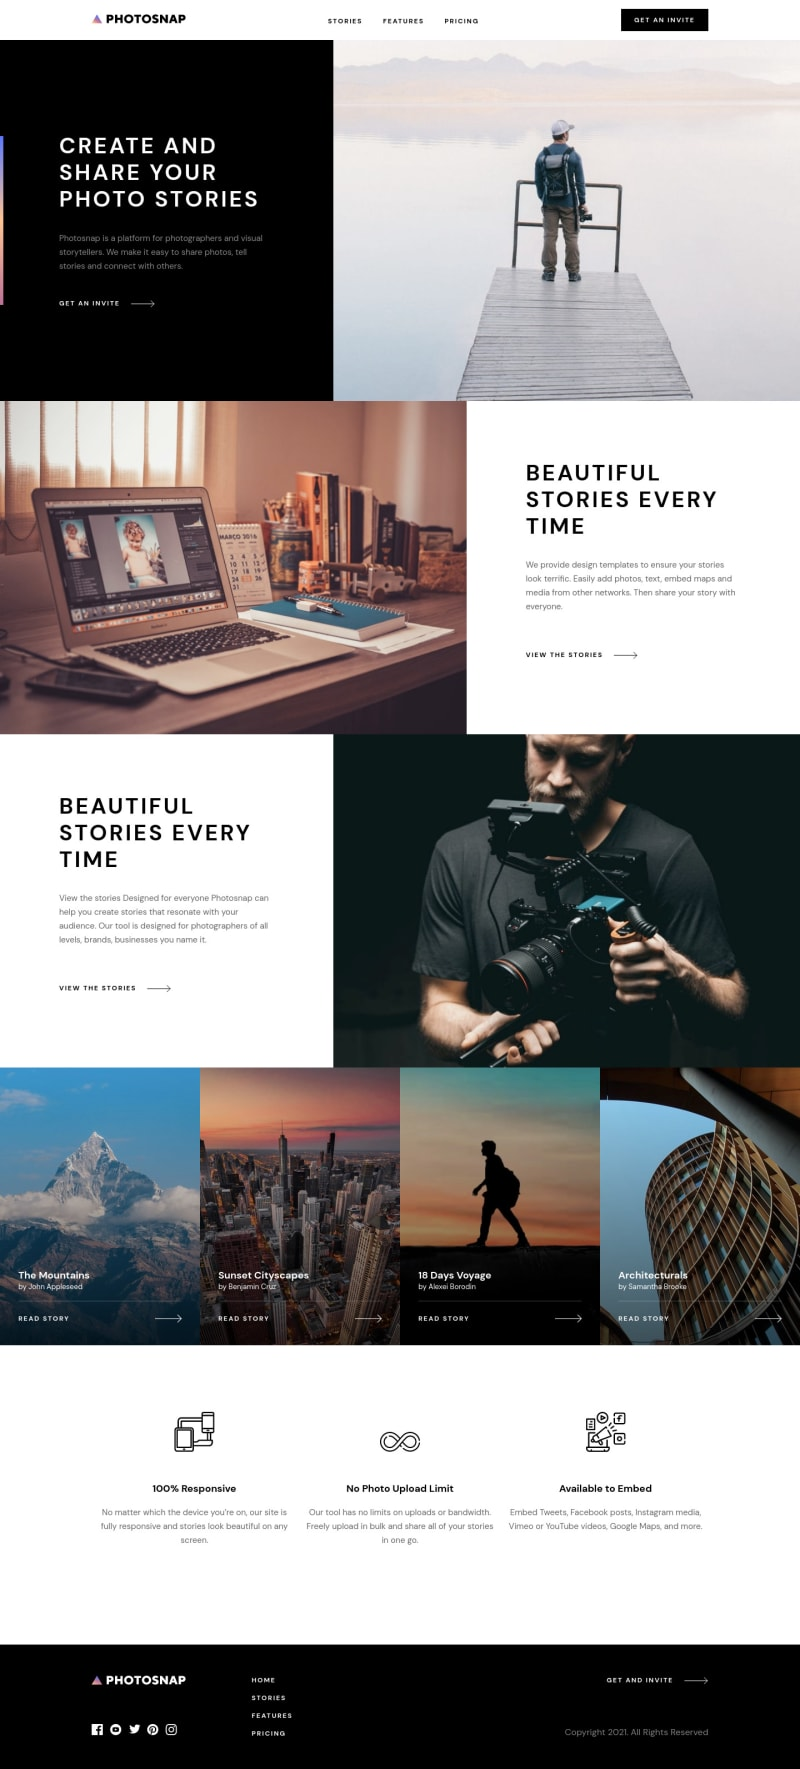 Desktop design screenshot for the Photosnap multi-page website coding challenge